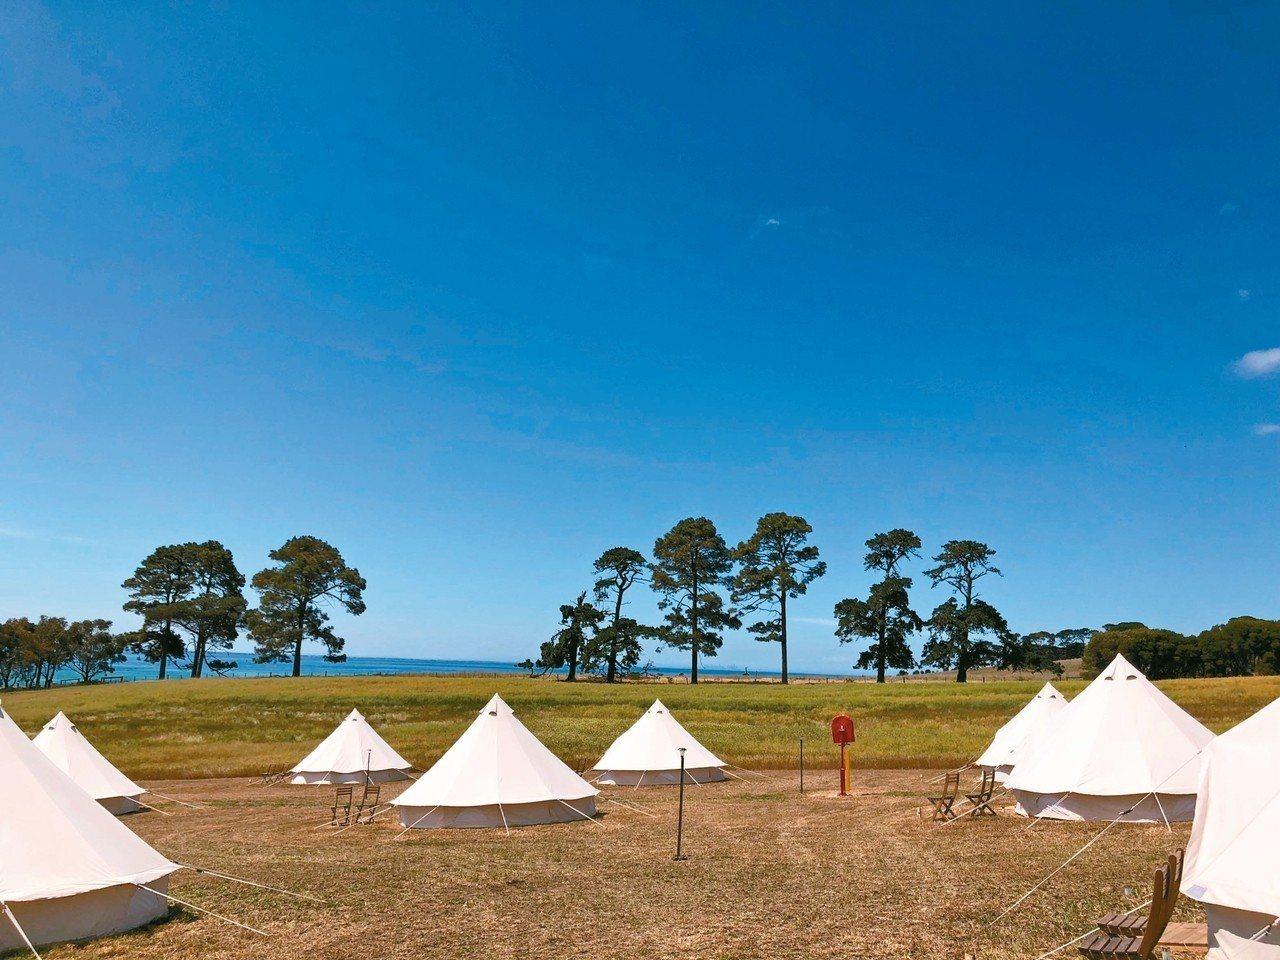 Terindah Estate擁有驚人美麗的私人海灘與奢華露營地。 記者錢欽青/...